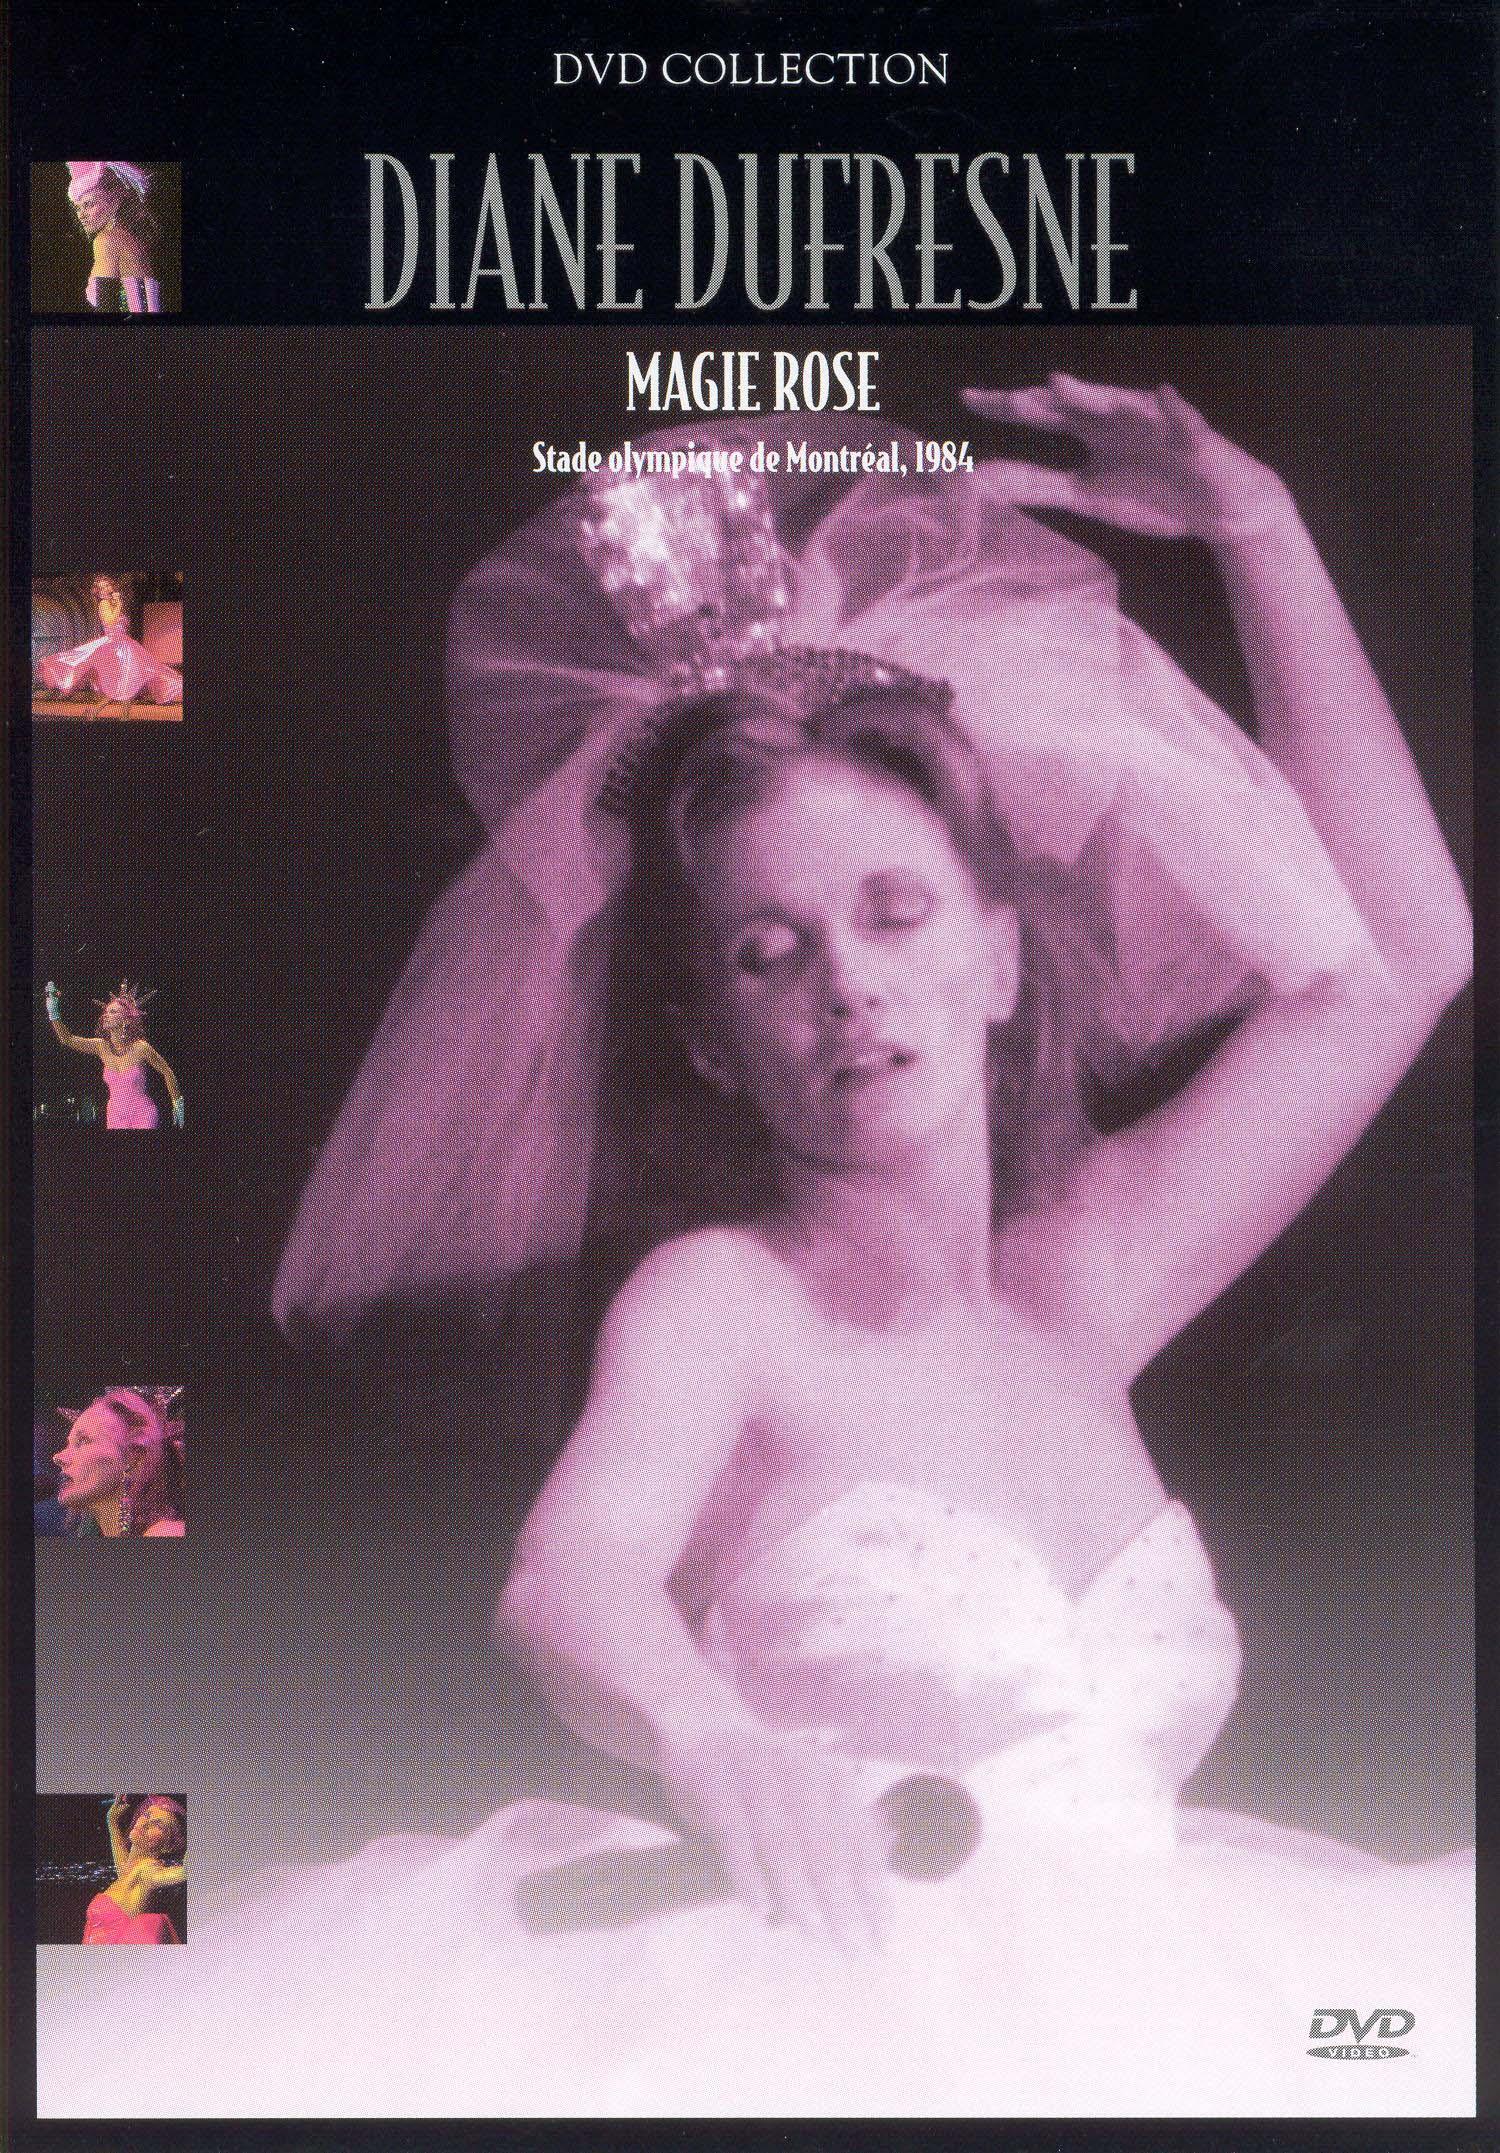 Diane Dufresne: Magie Rose